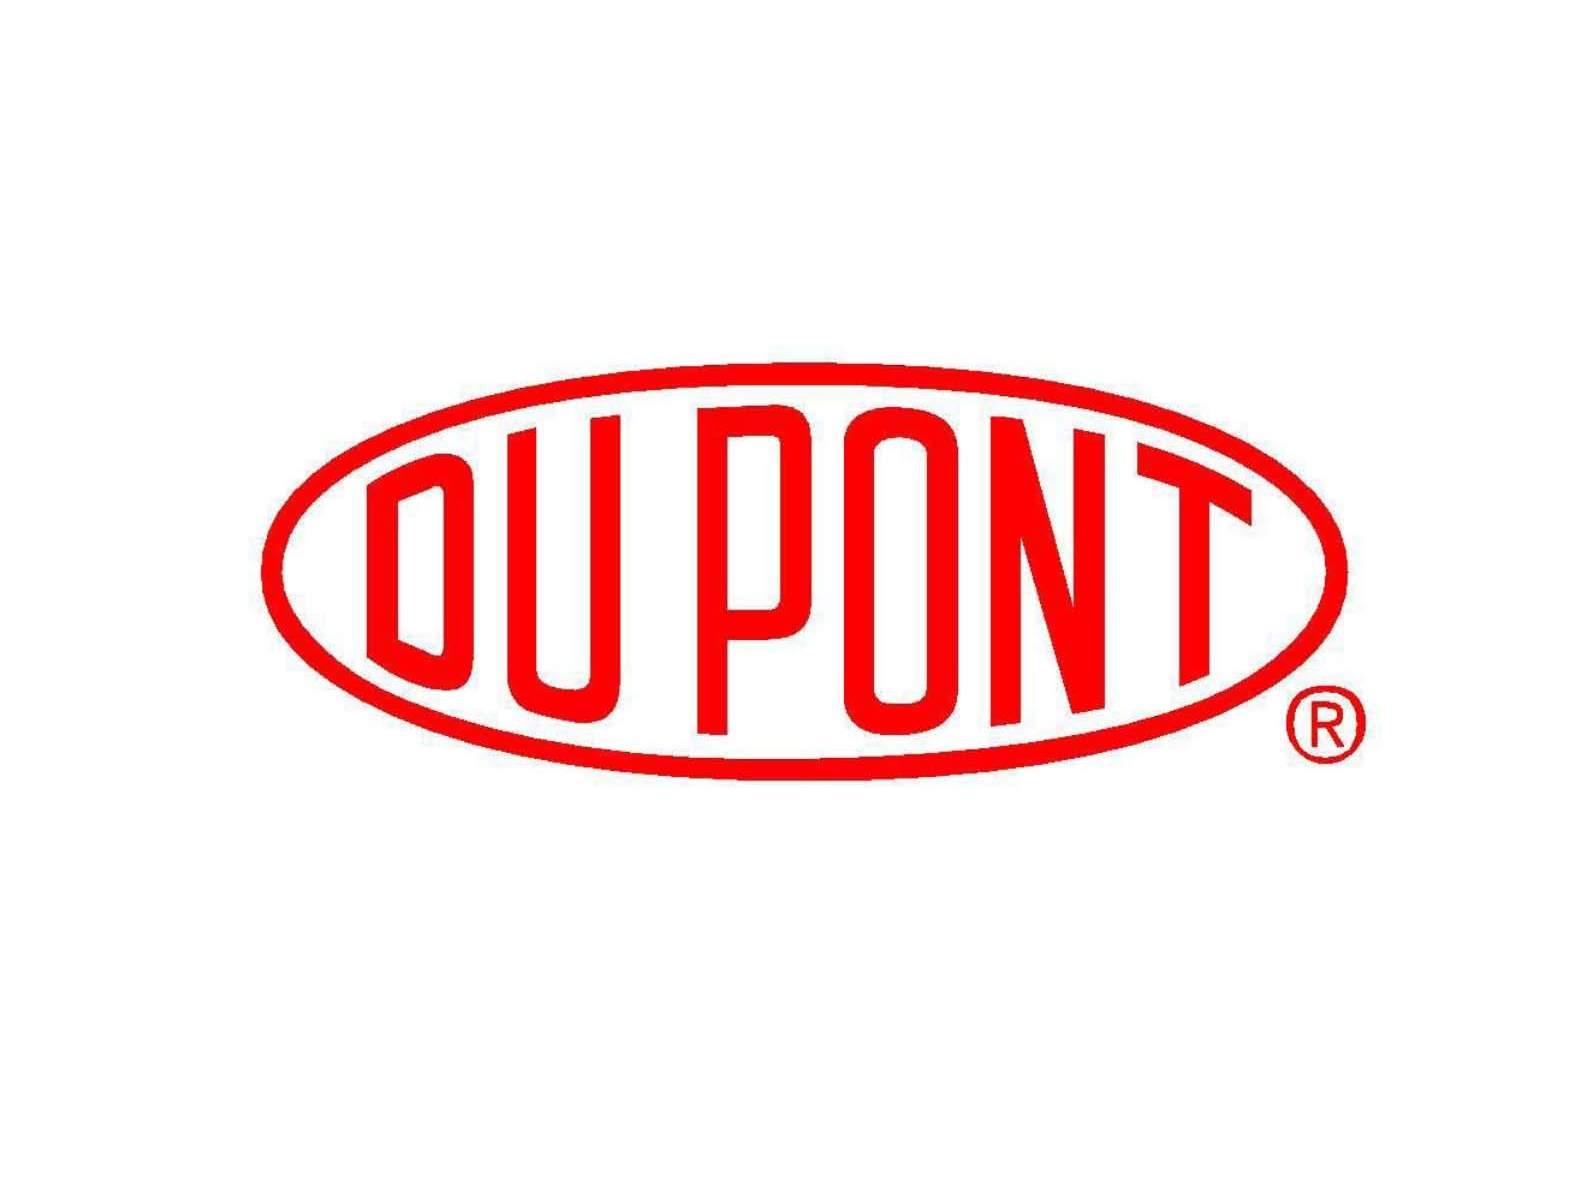 DuPont bioplastic